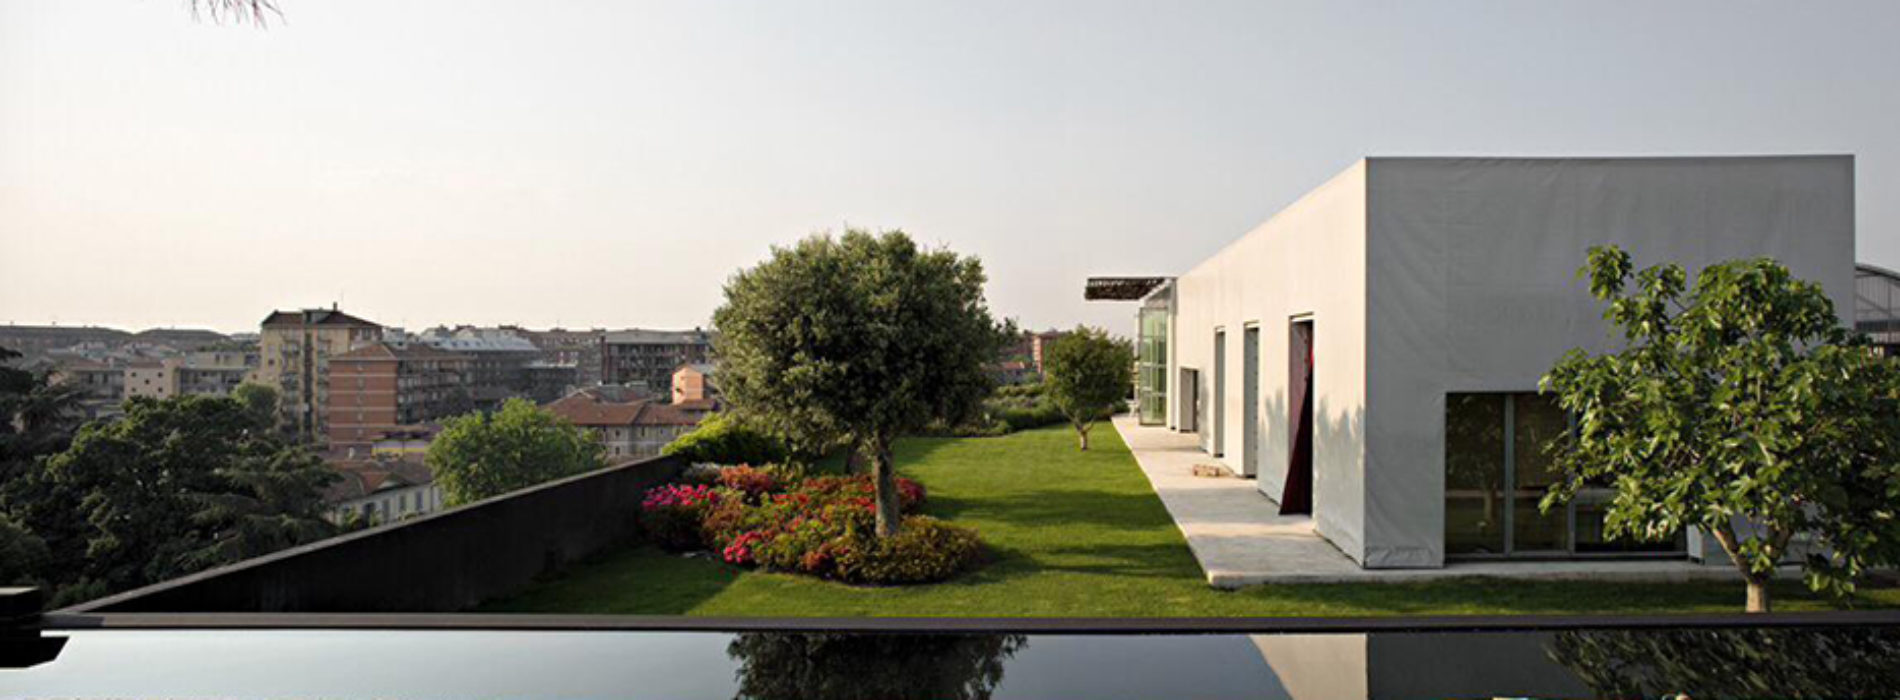 Visionair Milano, un nuovo rooftop come a Williamsburg